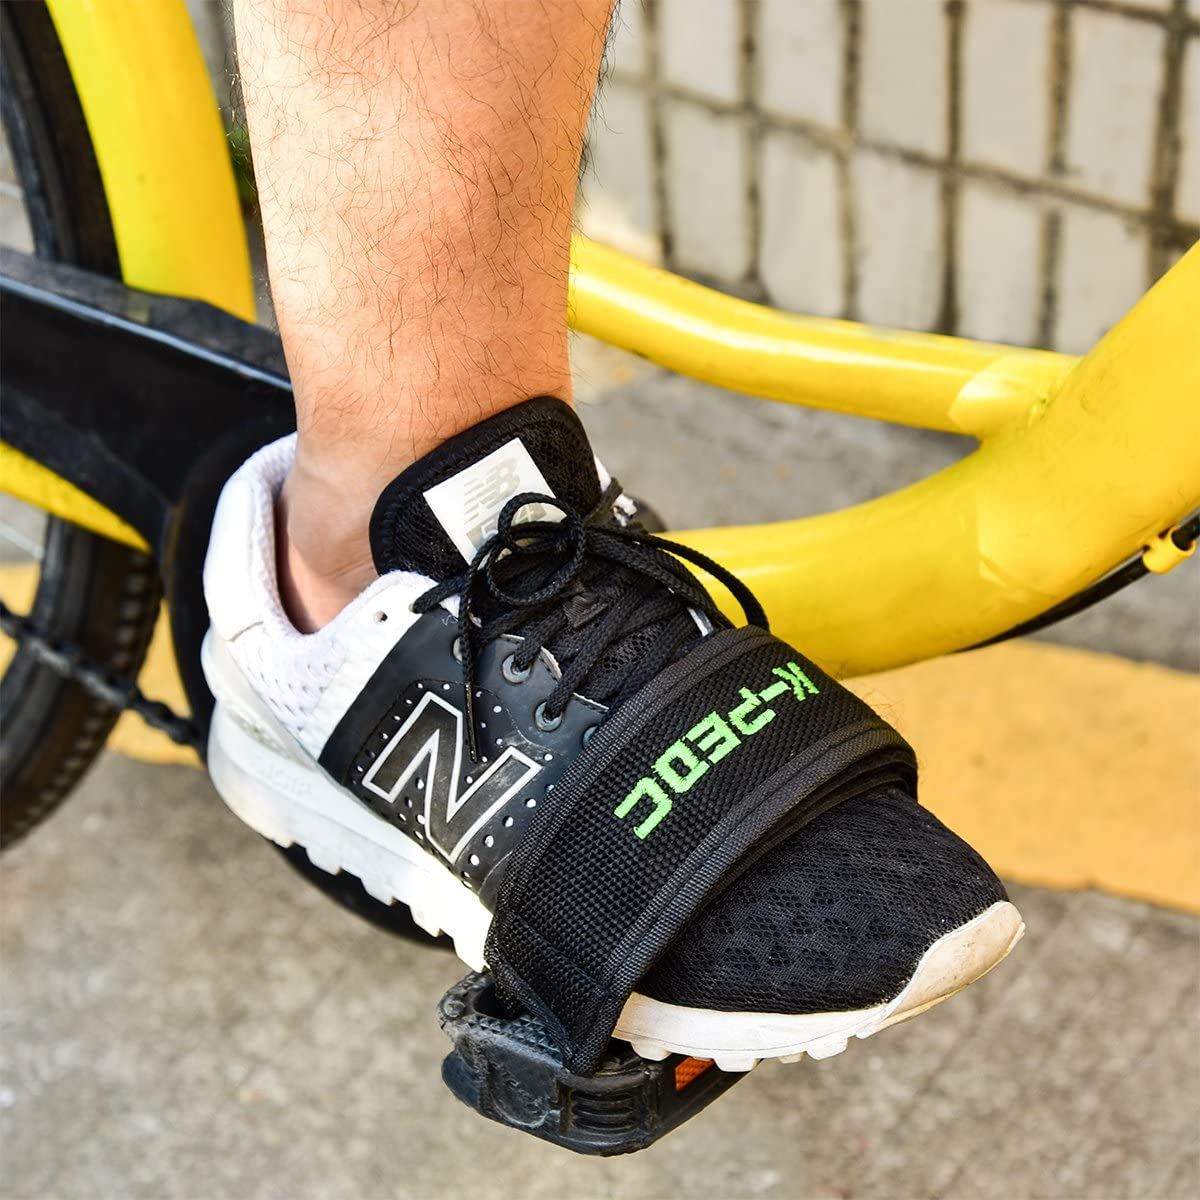 ZOSEN Bicycle Pedal Straps for Fixed Gear Mountain Bike Nylon Pedal Straps for Beginners